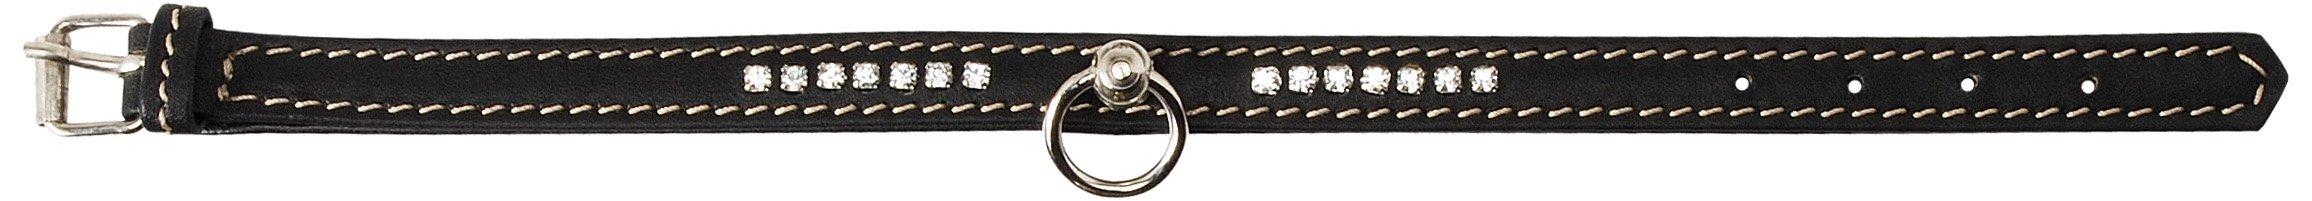 Petego La Cinopelca Flat Calfskin Collar with Crystals, Black, Medium, 1-Inch by 13-Inch